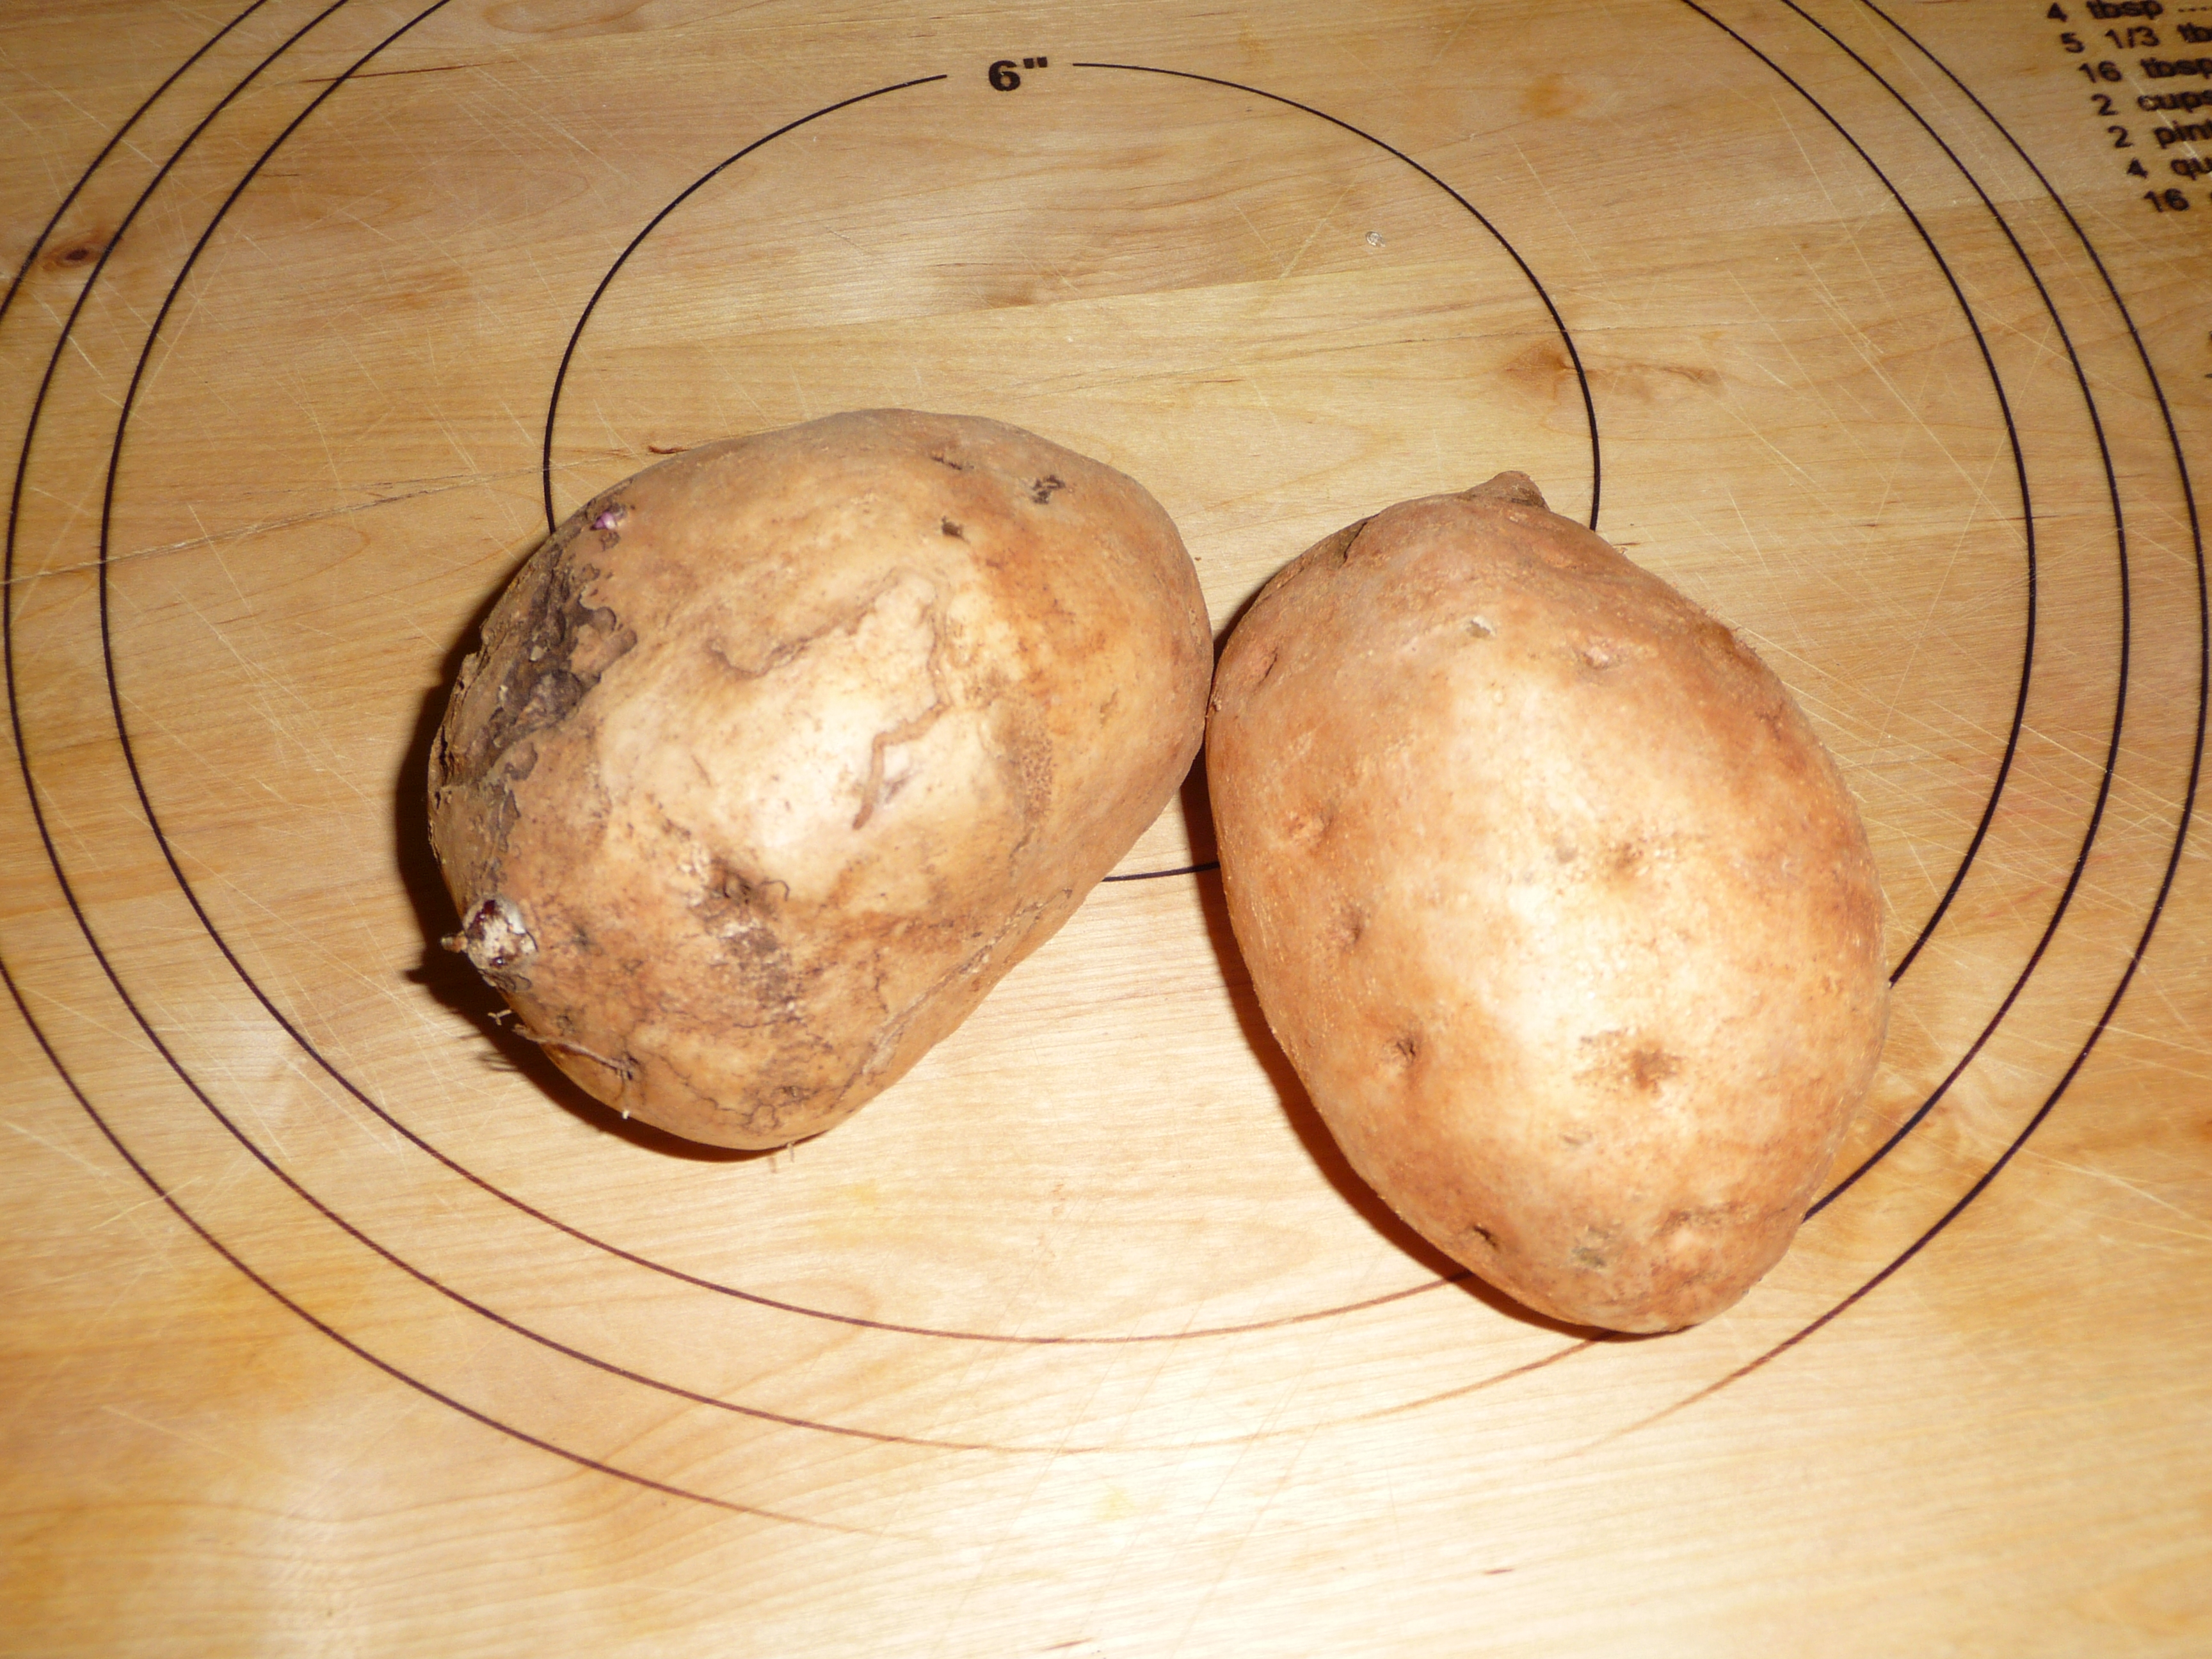 Okinawan potatoes